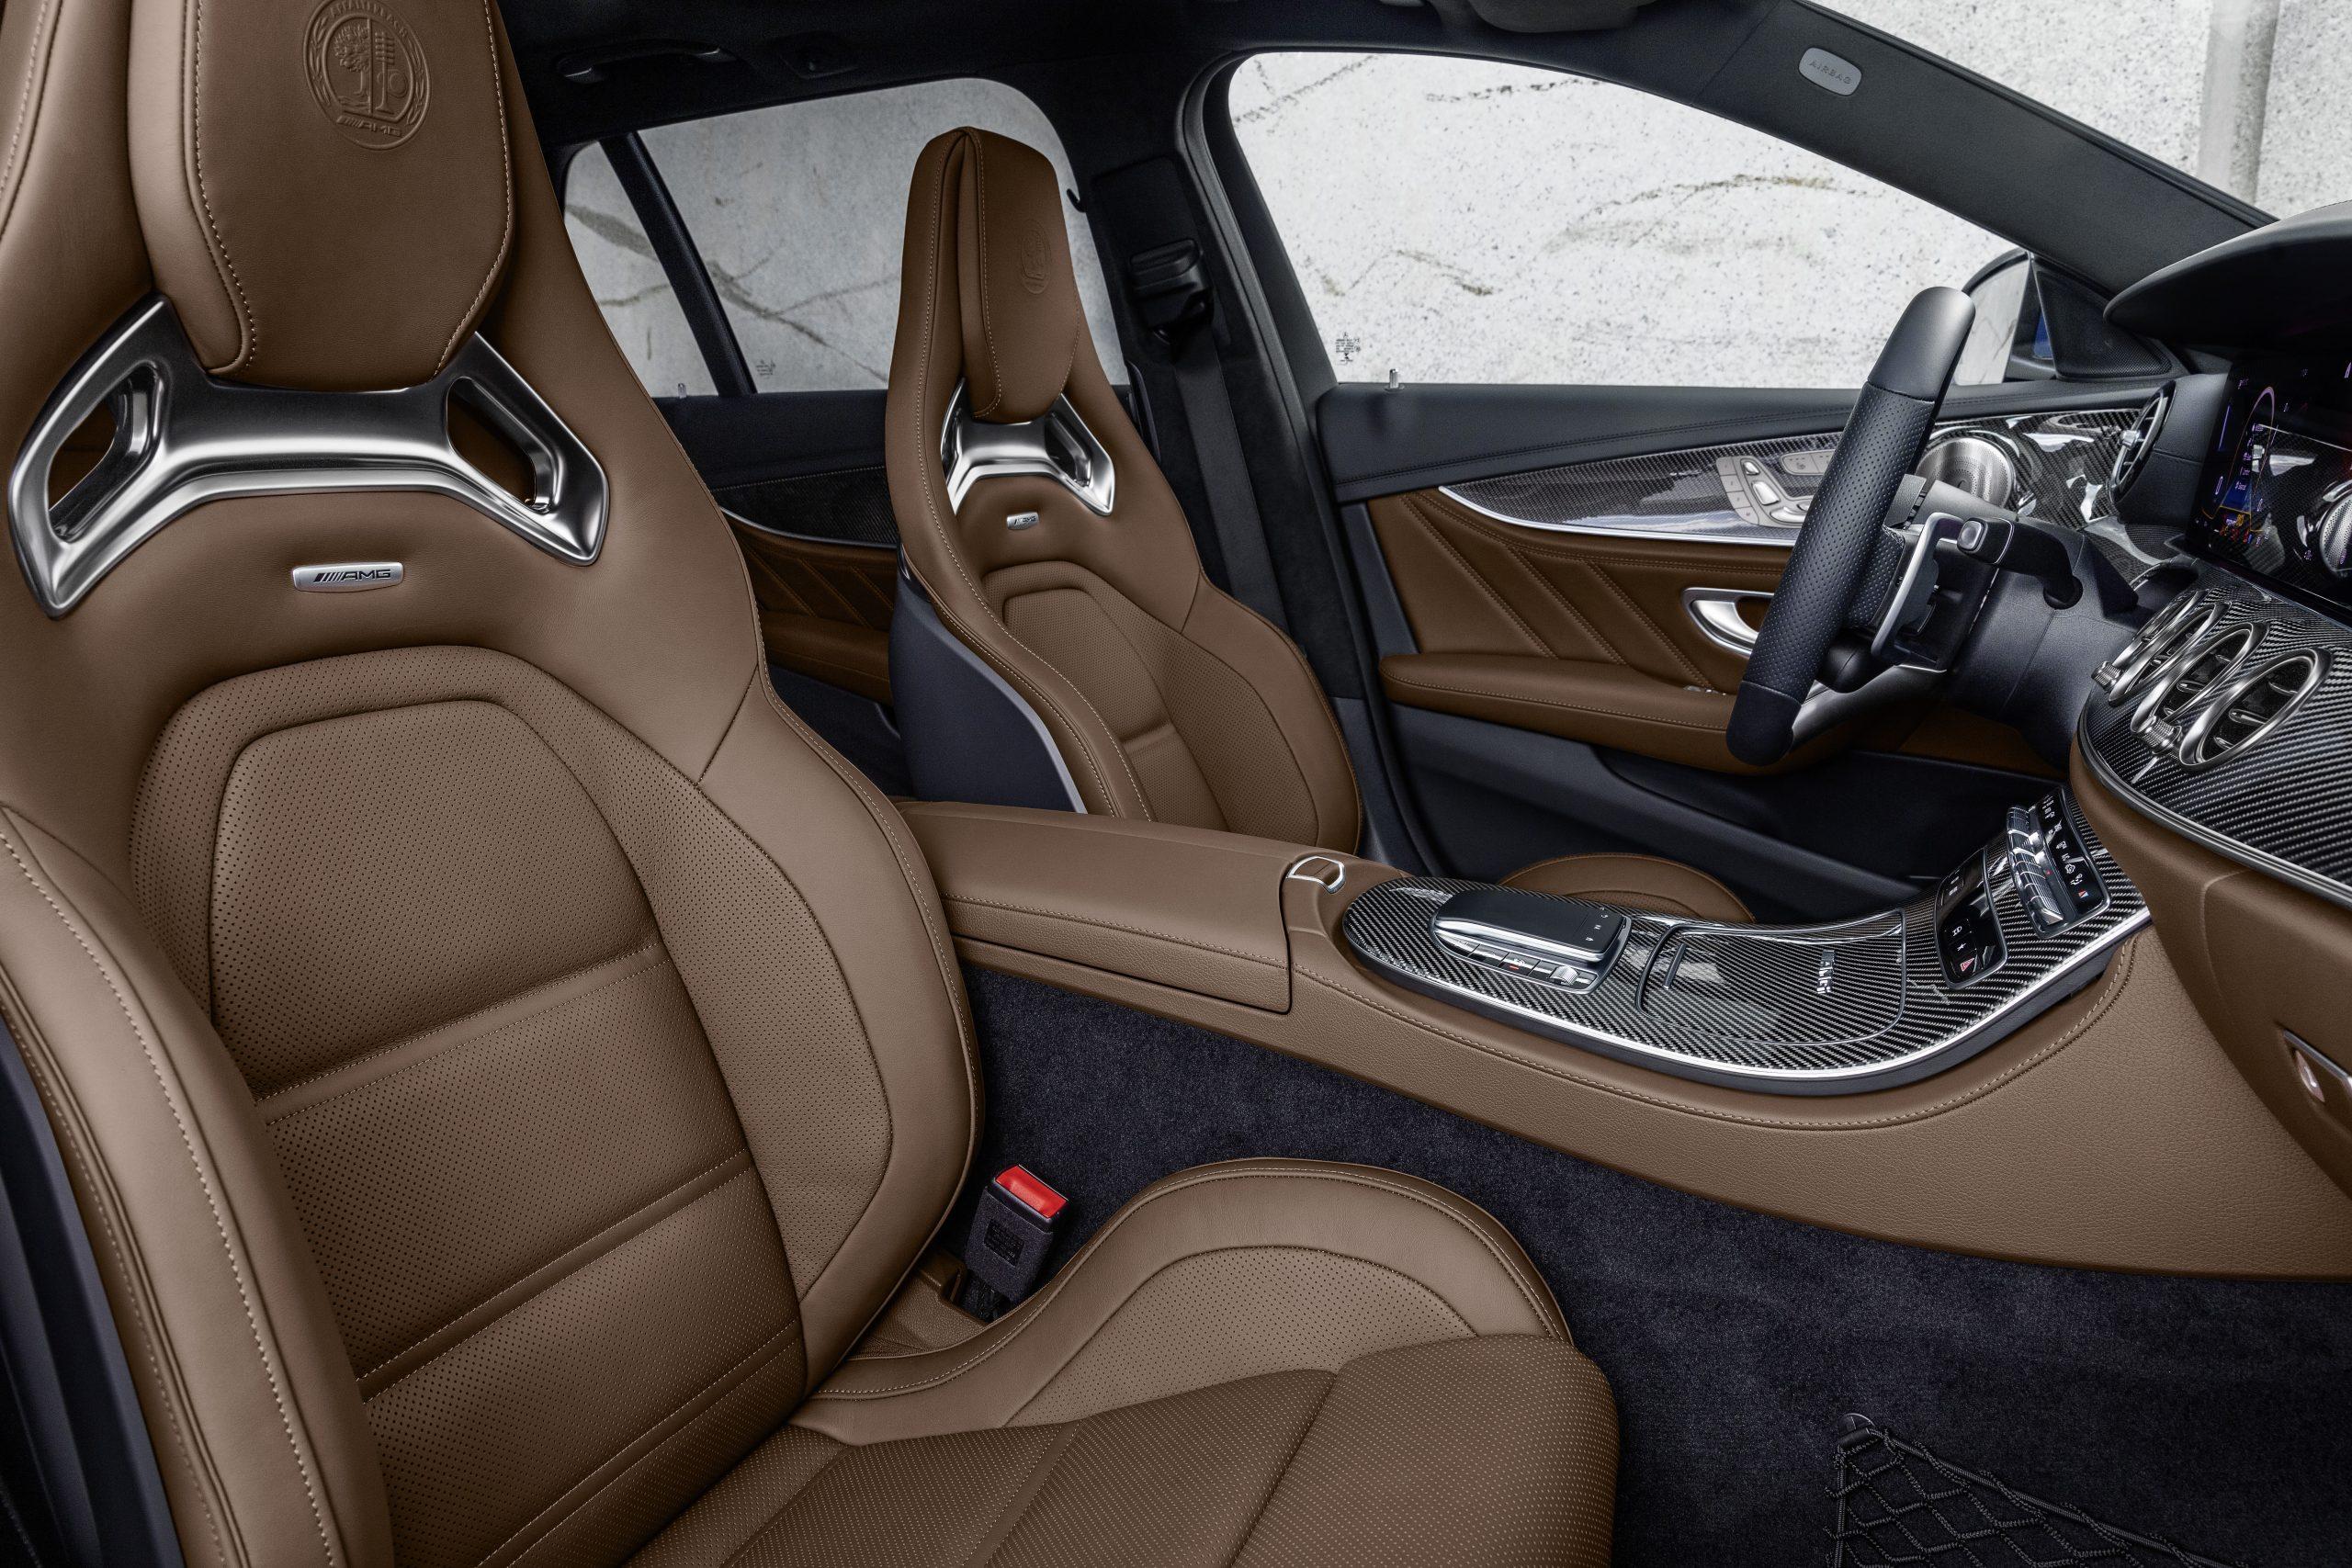 2021 Mercedes-AMG E63 S wagon interior